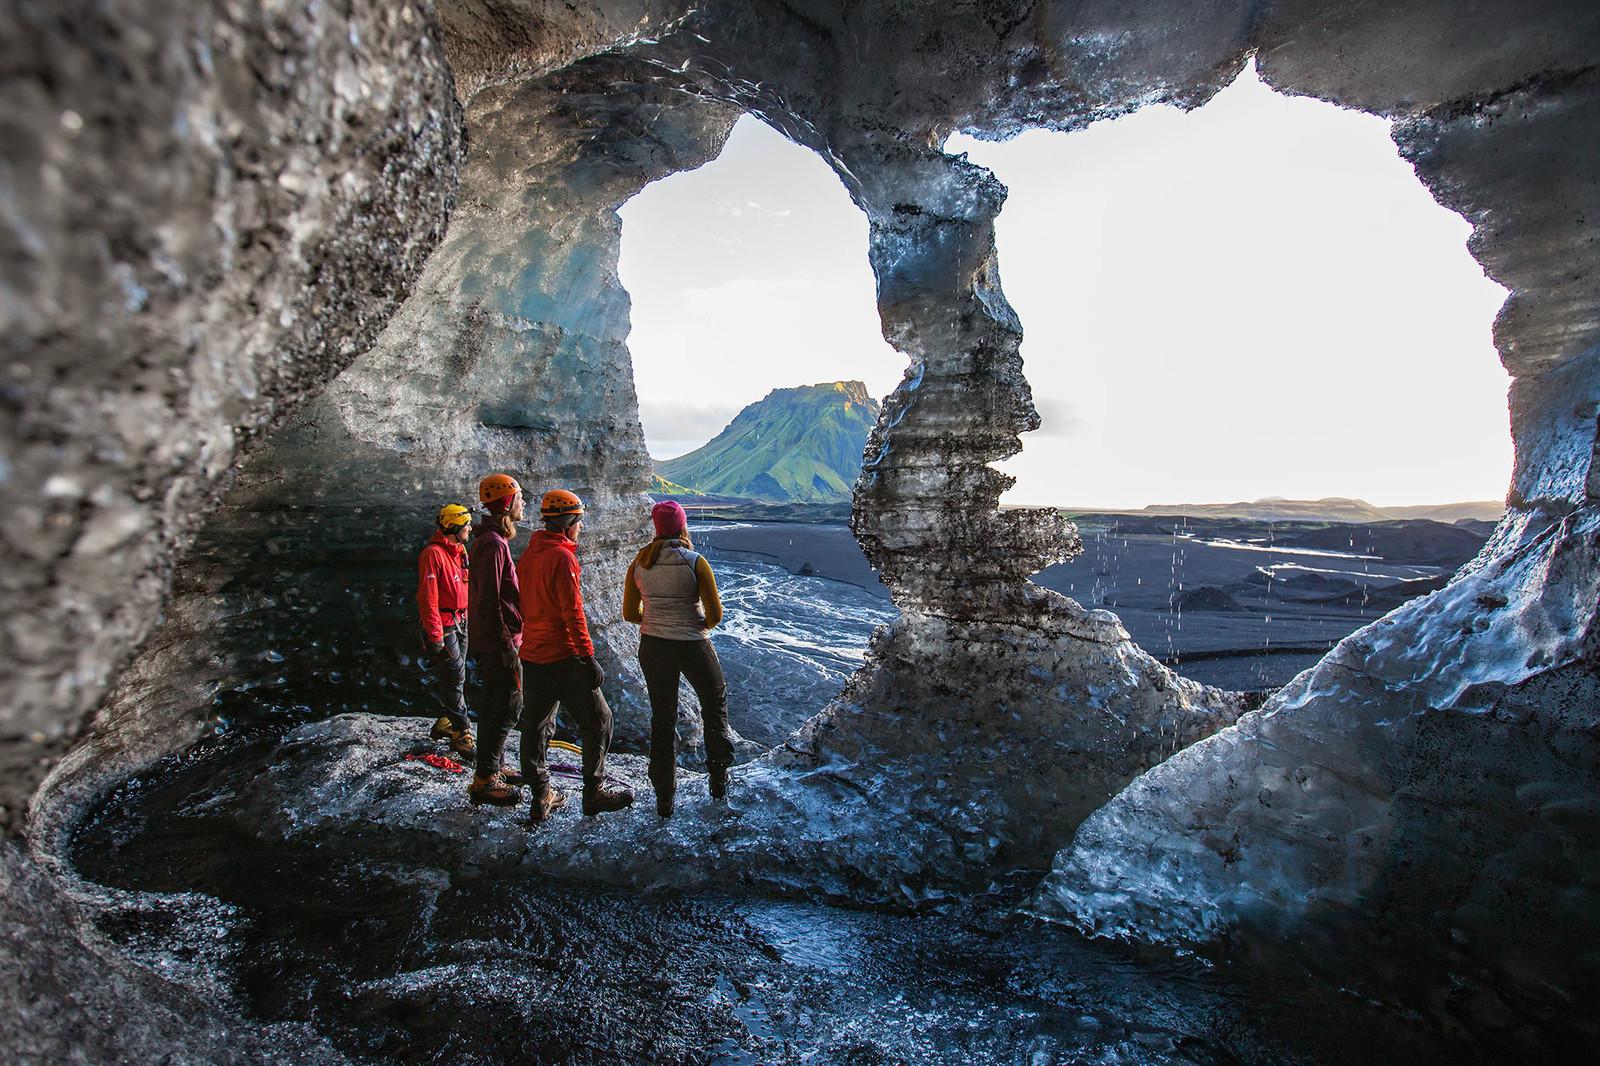 ice cave tour from reykjavík